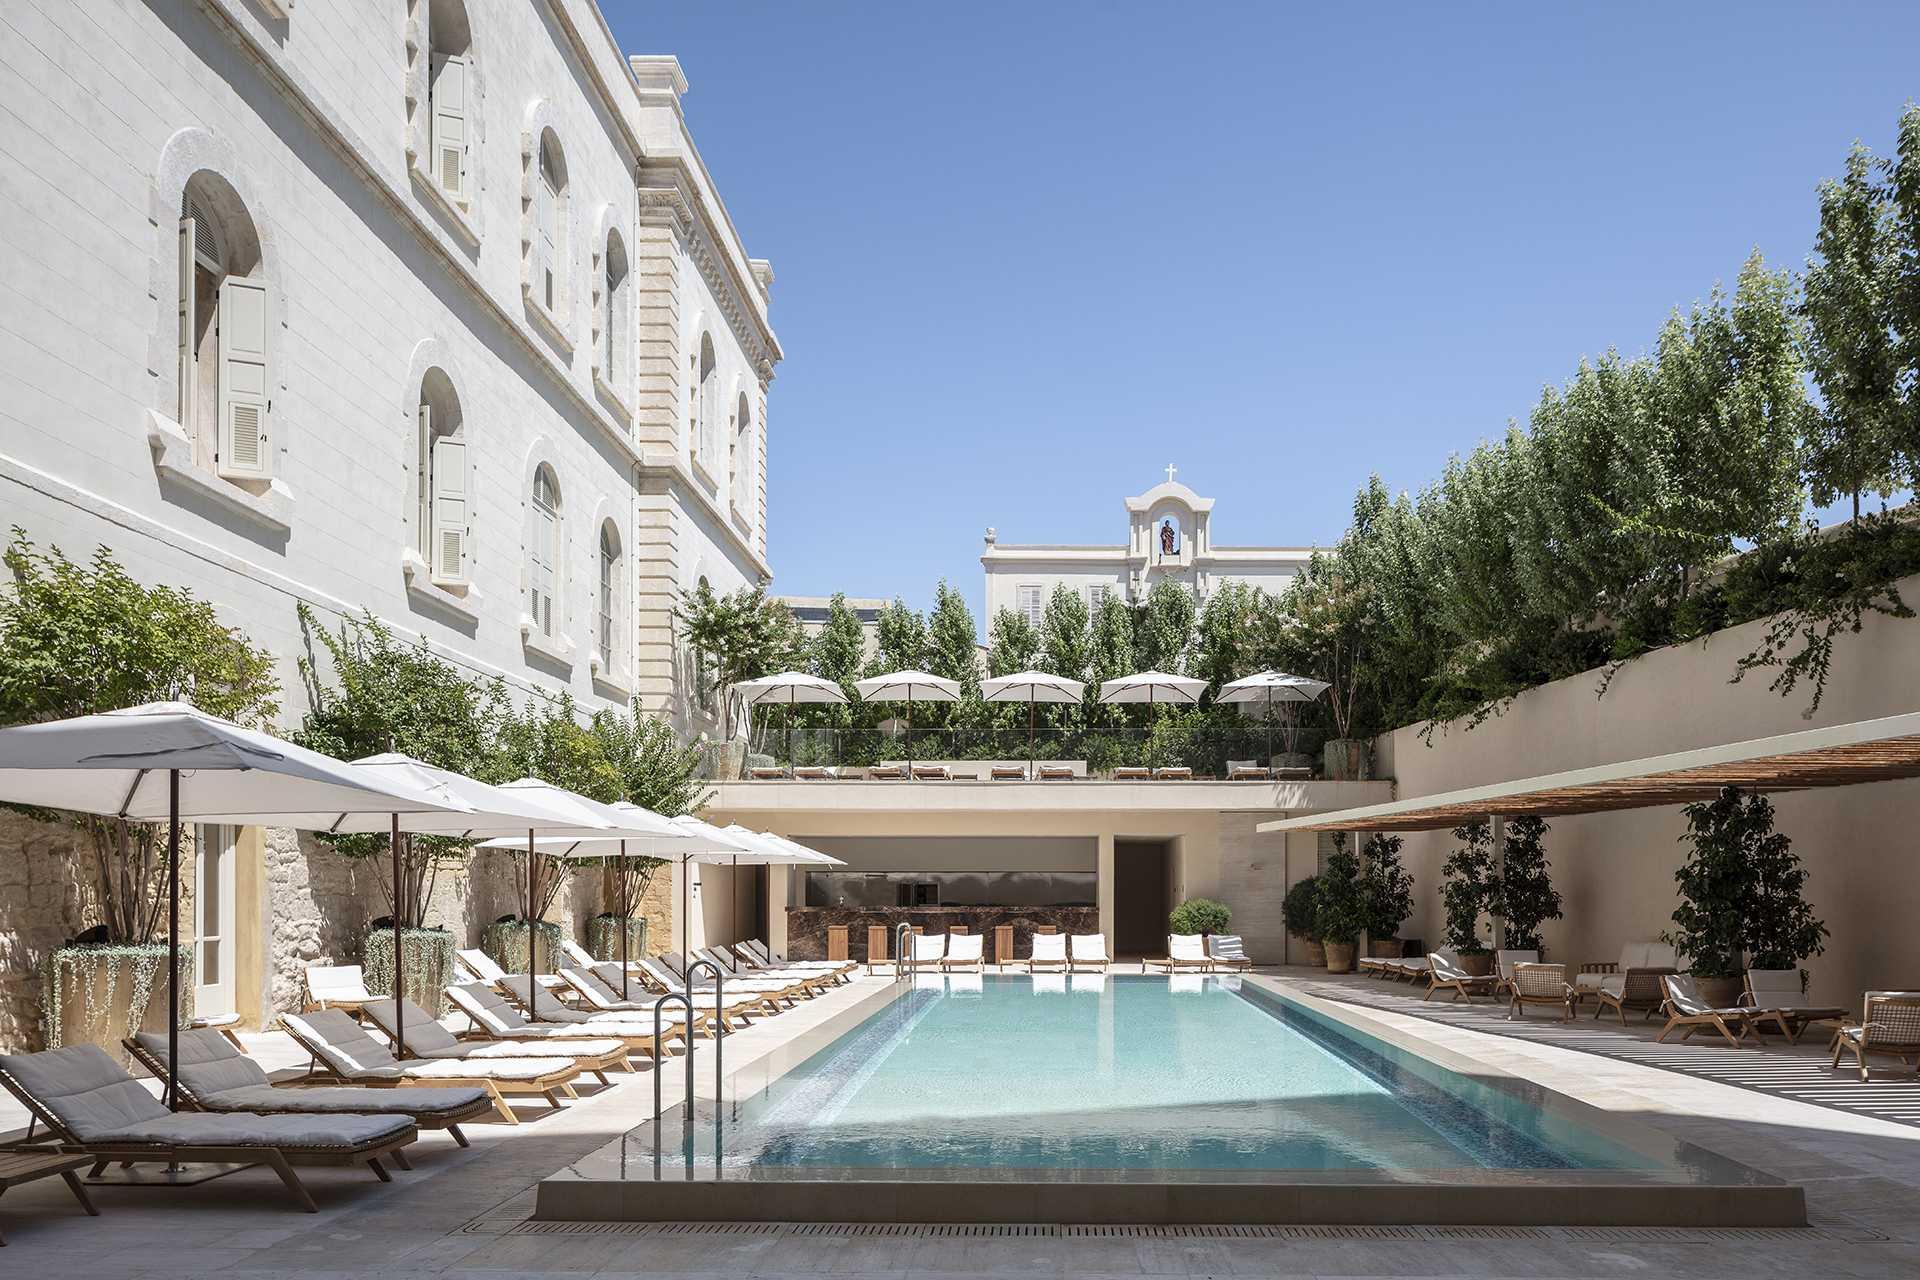 The Jaffa Hotel  - 06 JAFFA 36